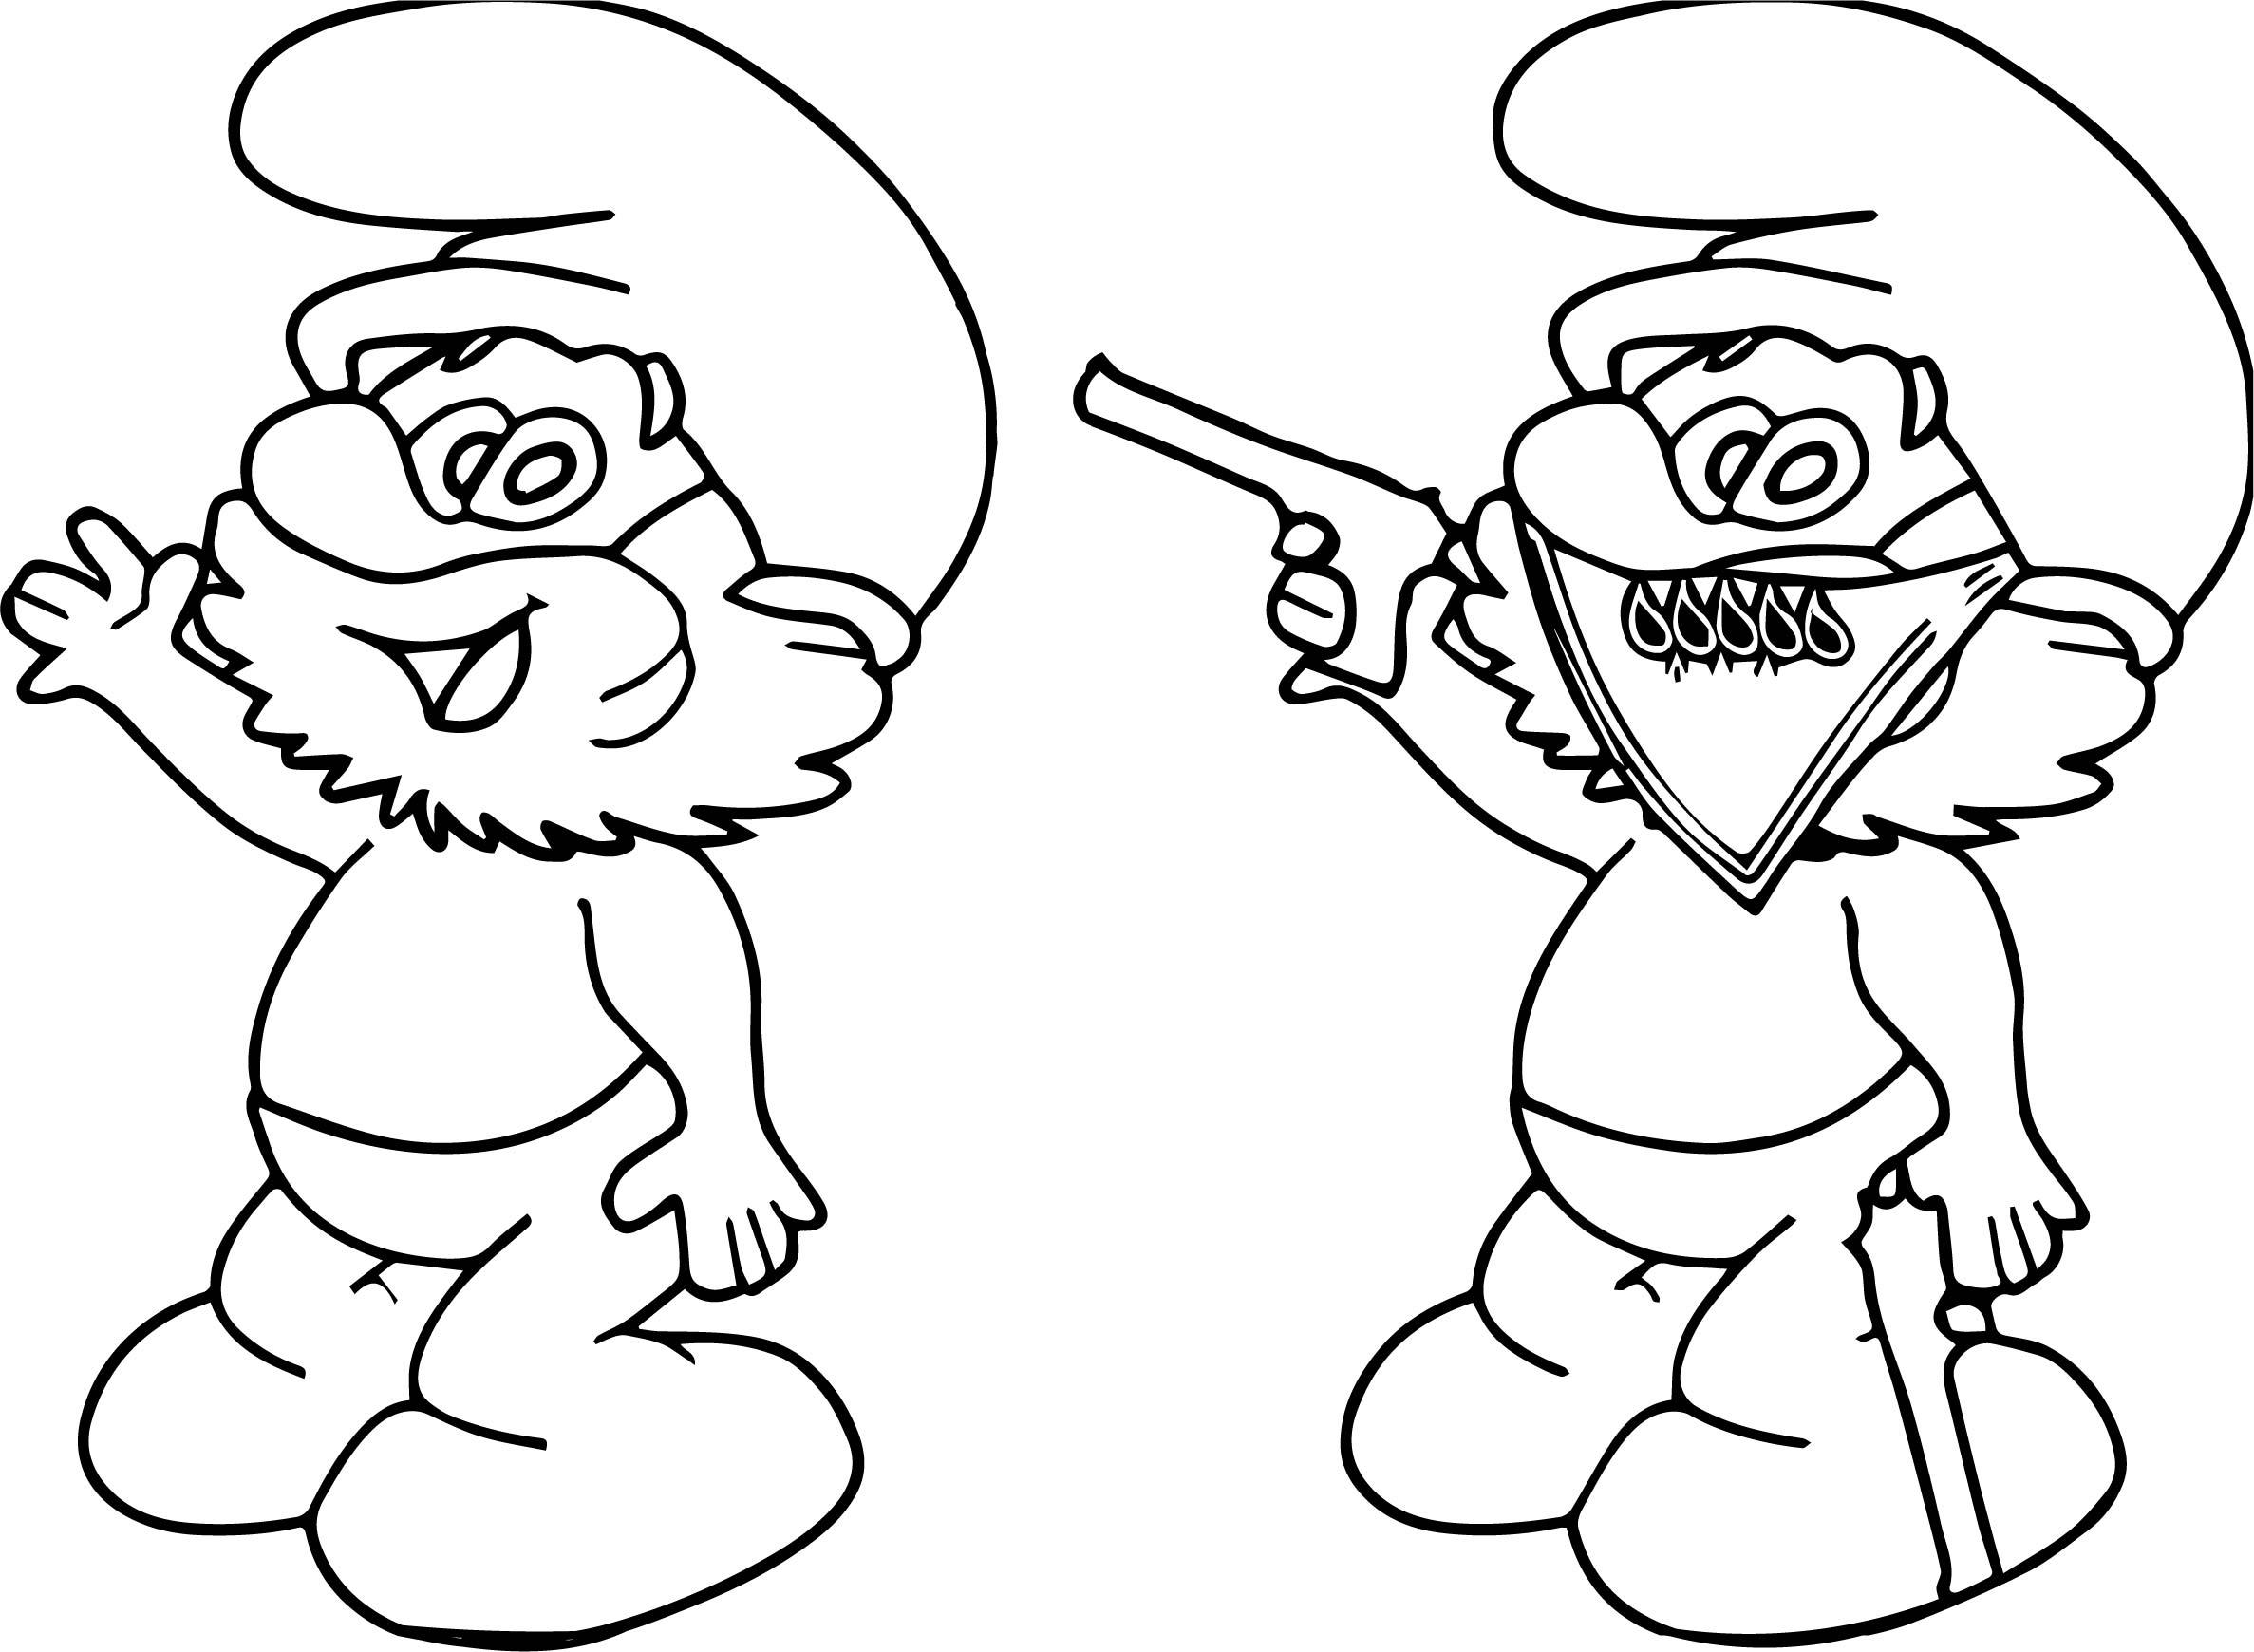 Good papa smurf vs gang papa smurf coloring page for Papa smurf coloring pages